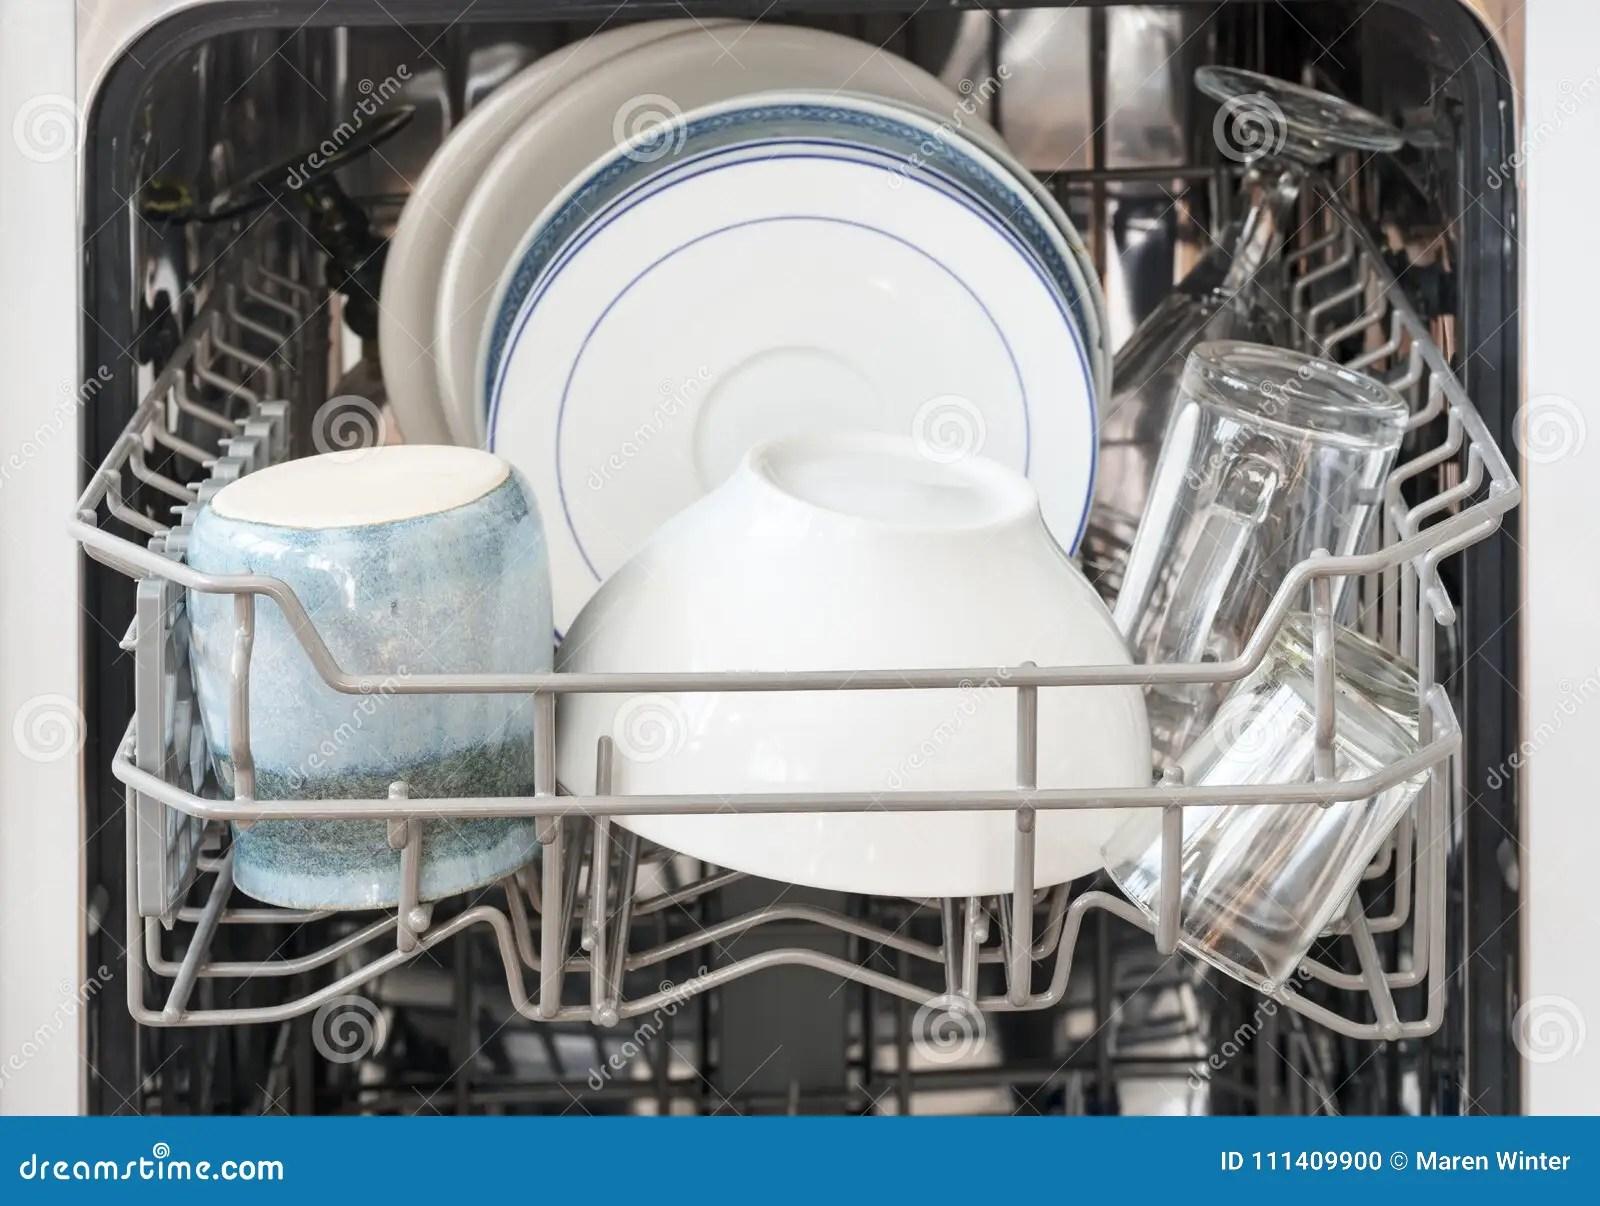 kitchen aid dishwashers kohler farmhouse sink 在洗碗机的篮子的盘 为清洗 slecte准备库存照片 图片包括有牌照 slecte准备